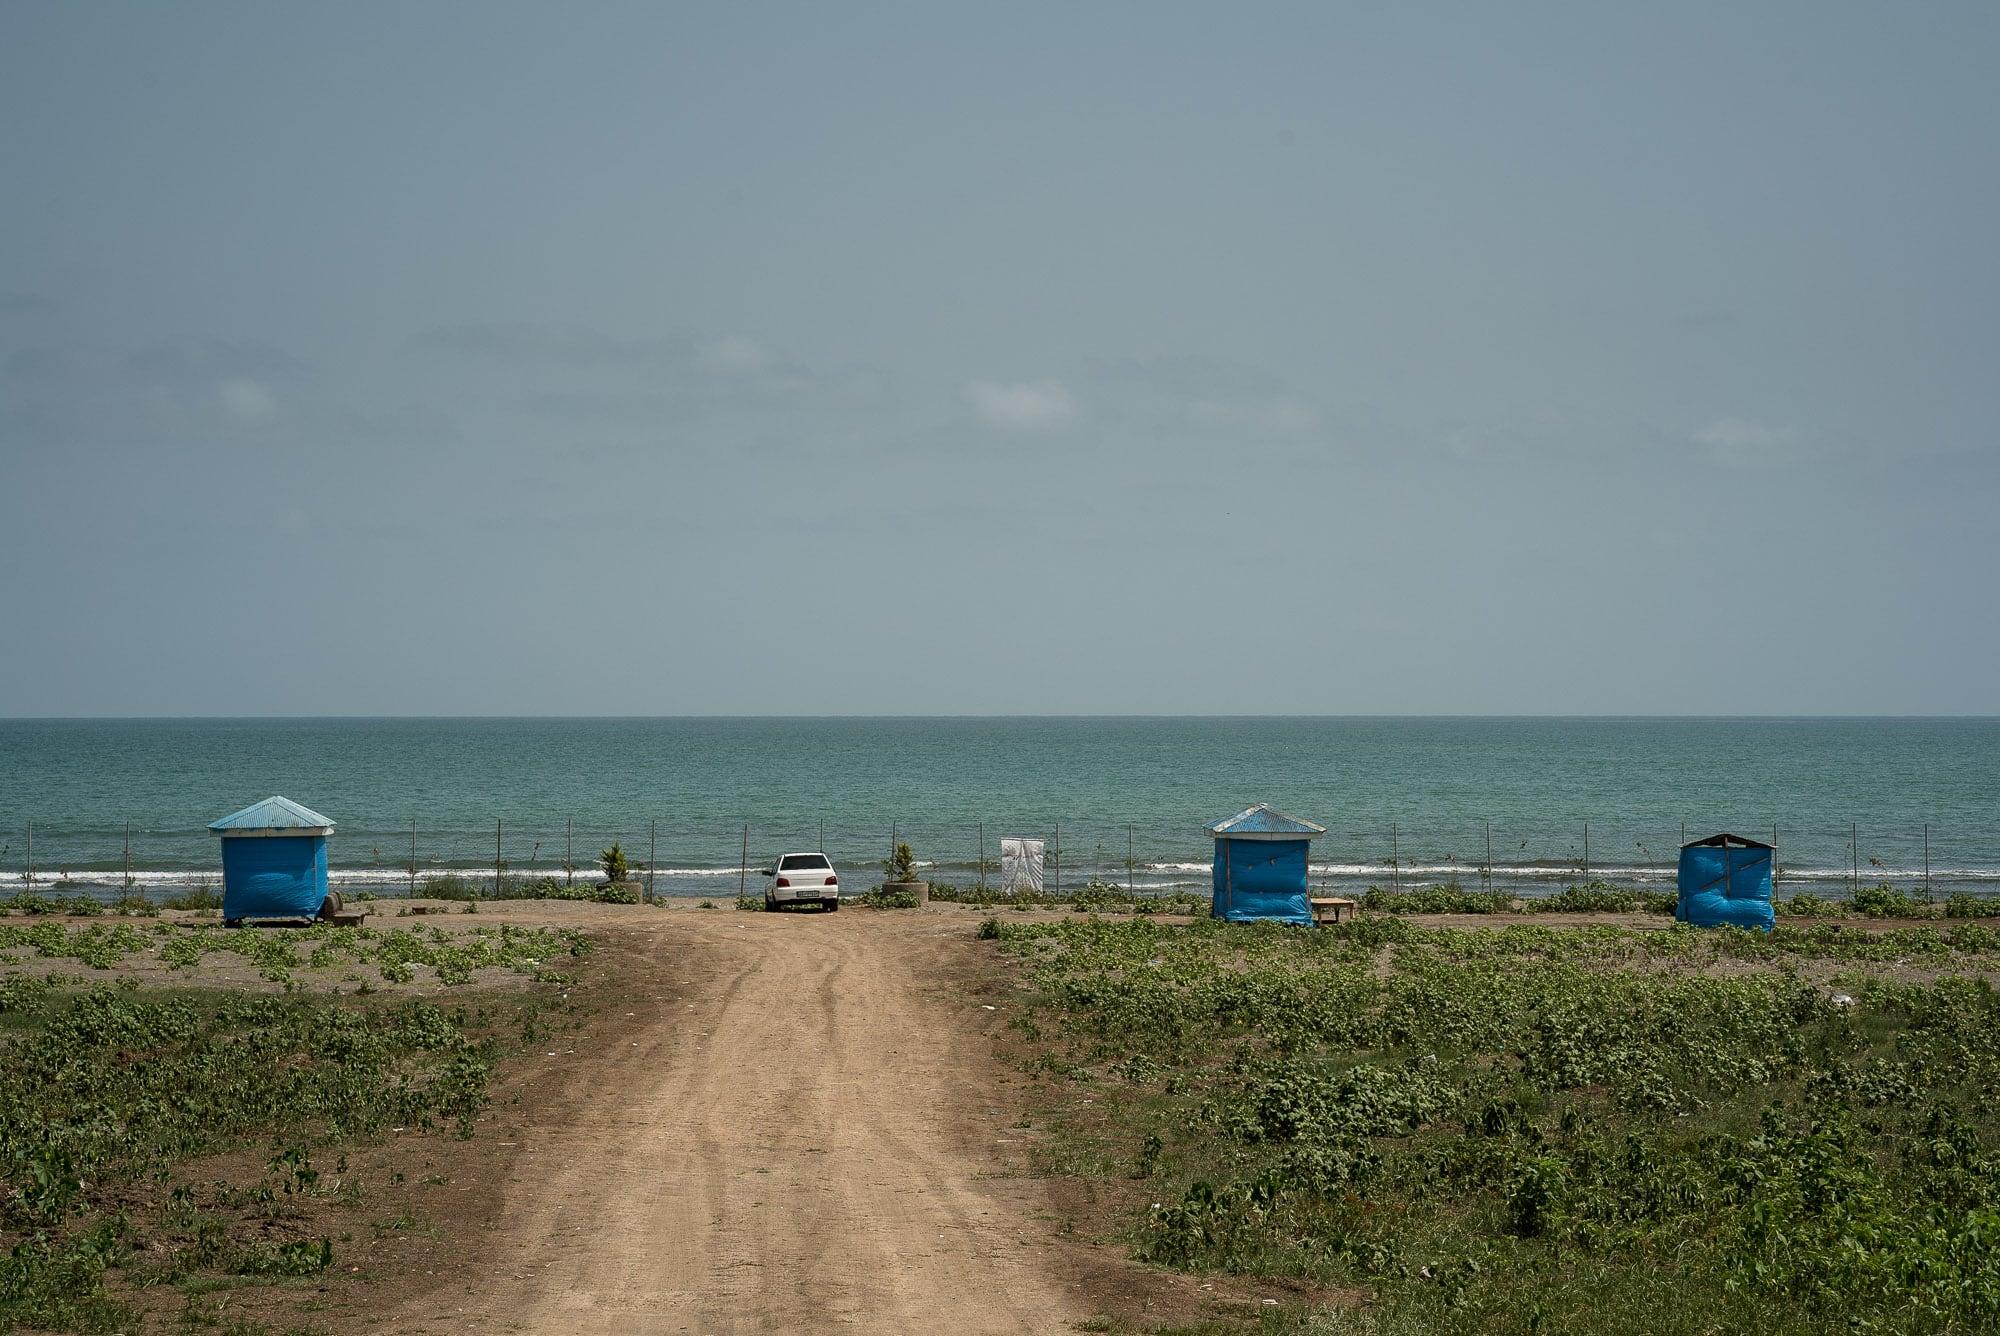 view of the Caspian